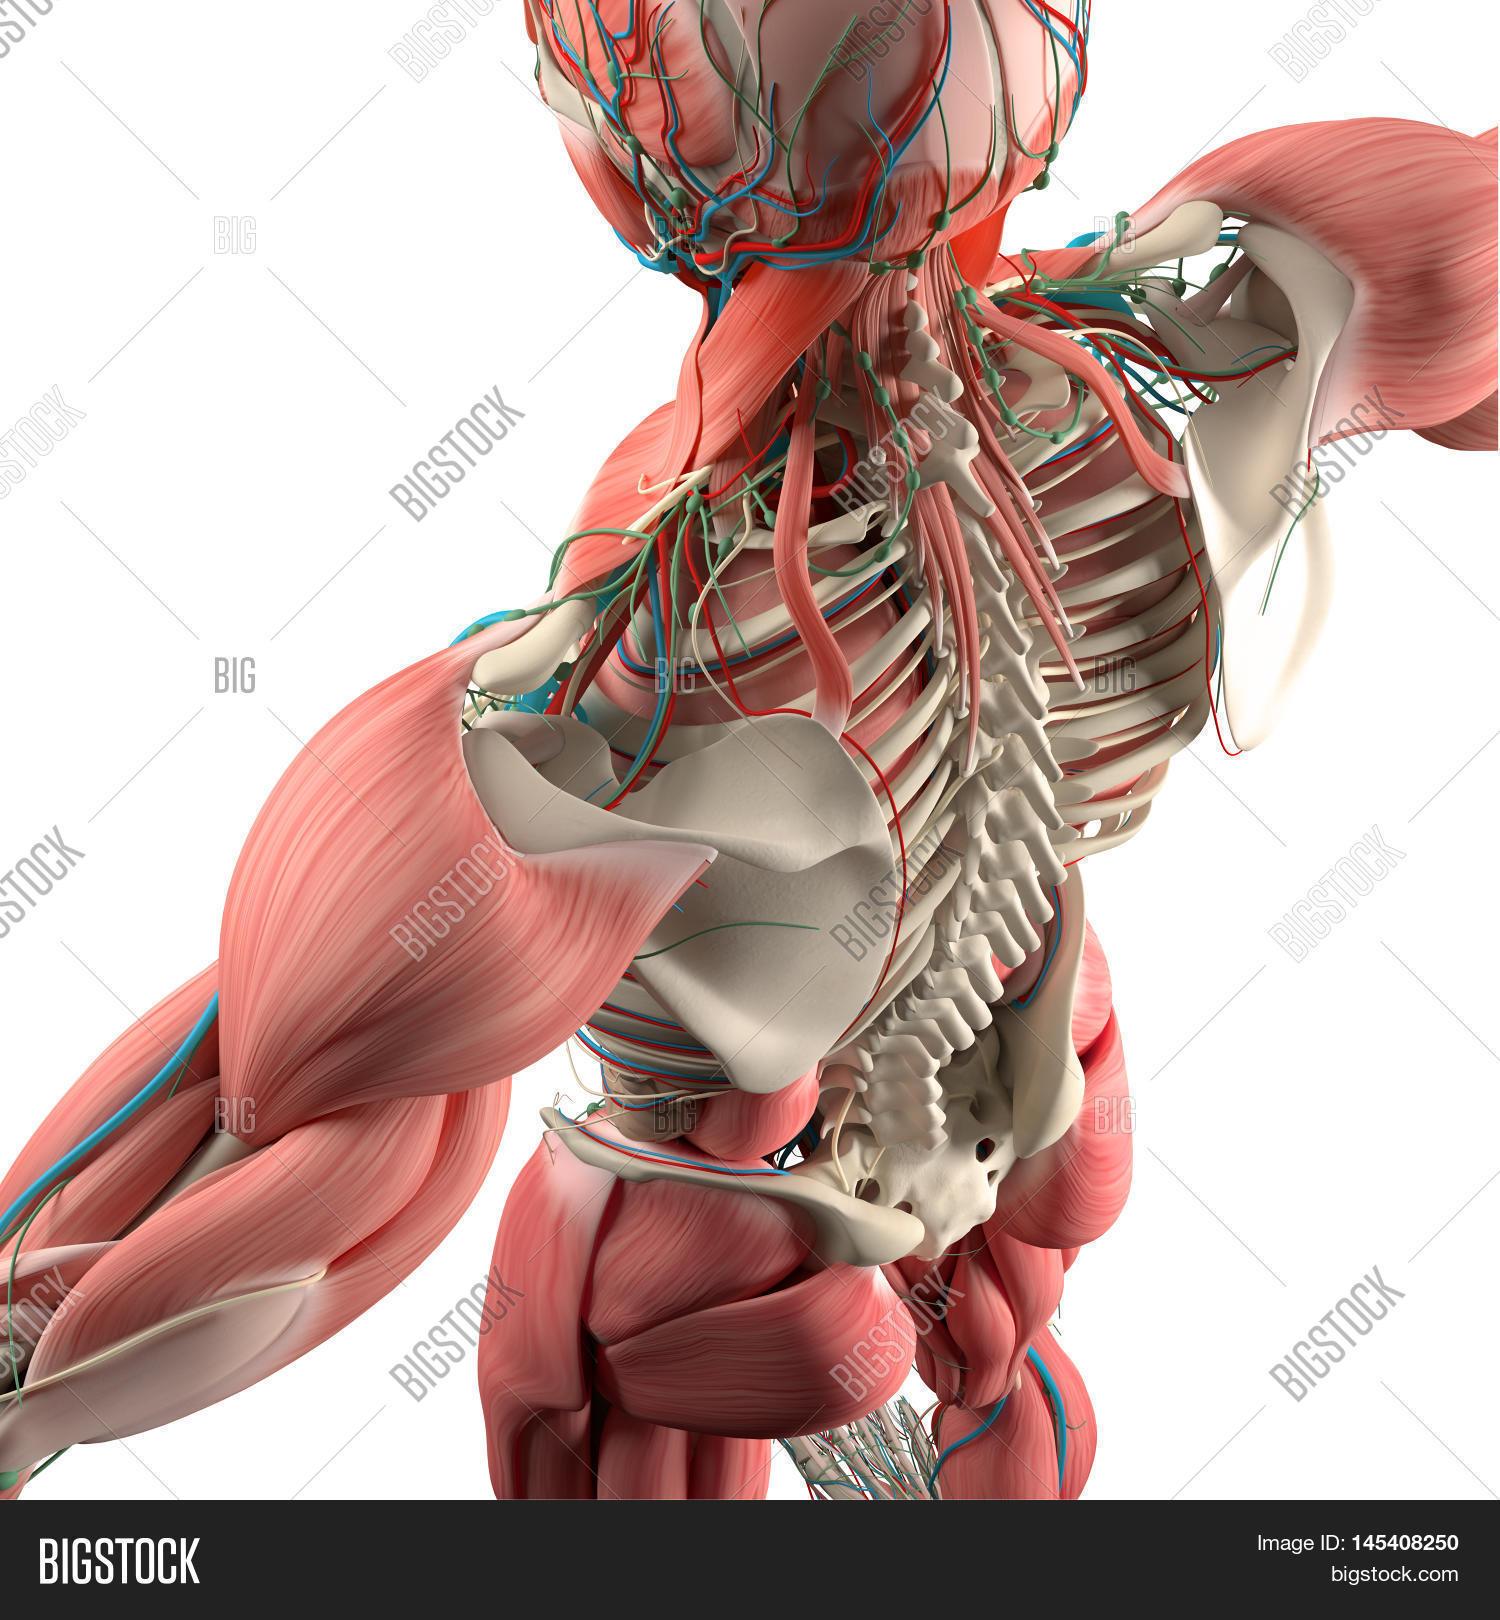 Human Anatomy, Back, Image & Photo (Free Trial) | Bigstock